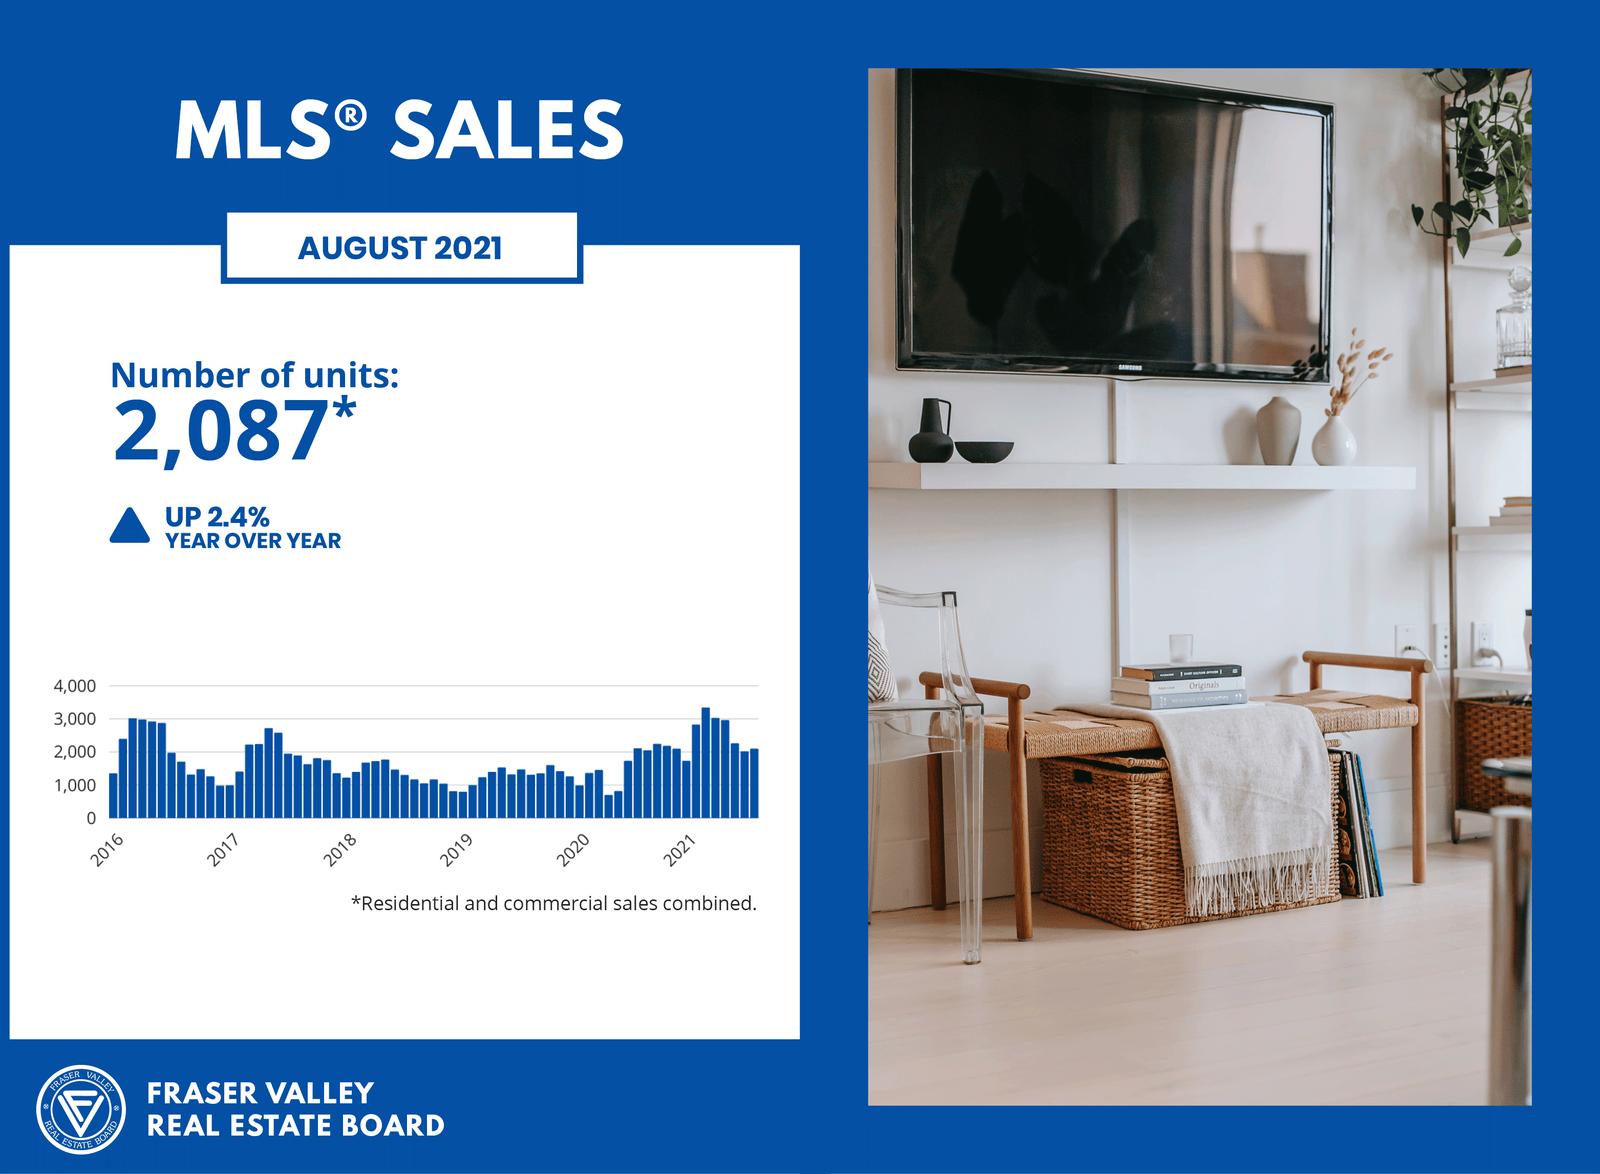 Fraser Valley Real Estate Board August 2021 - MLS Sales